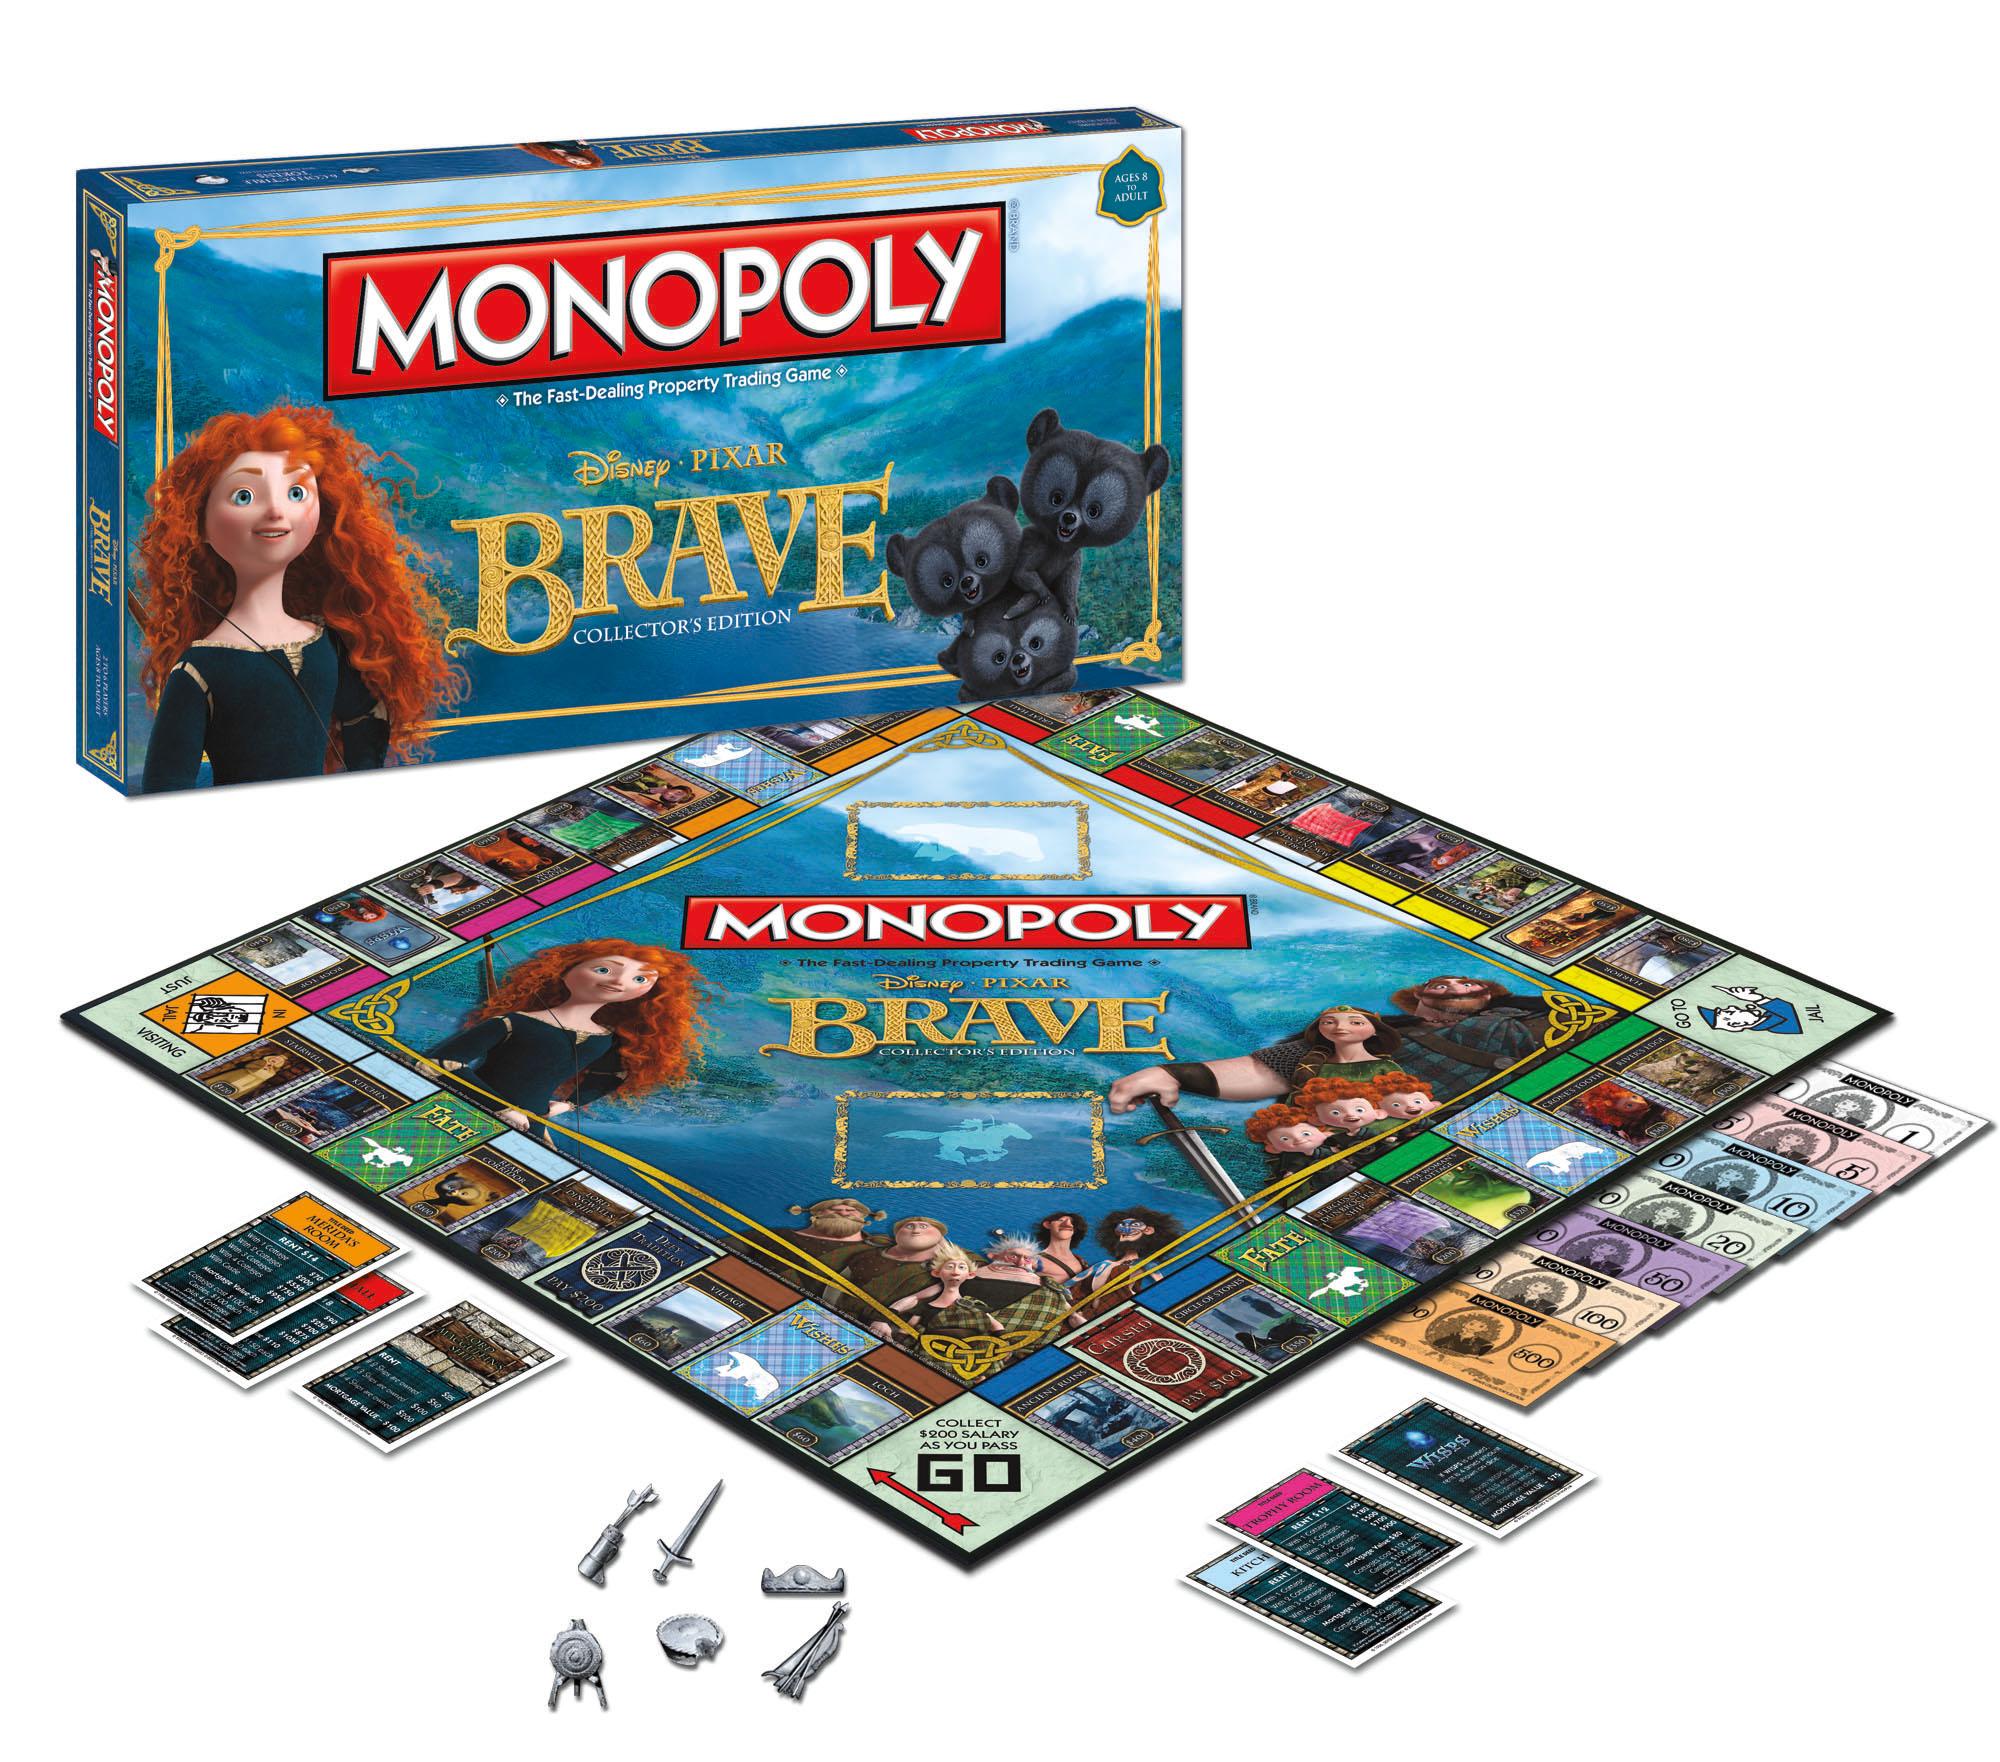 'Brave' Monopoly Rolls Onto Store Shelves